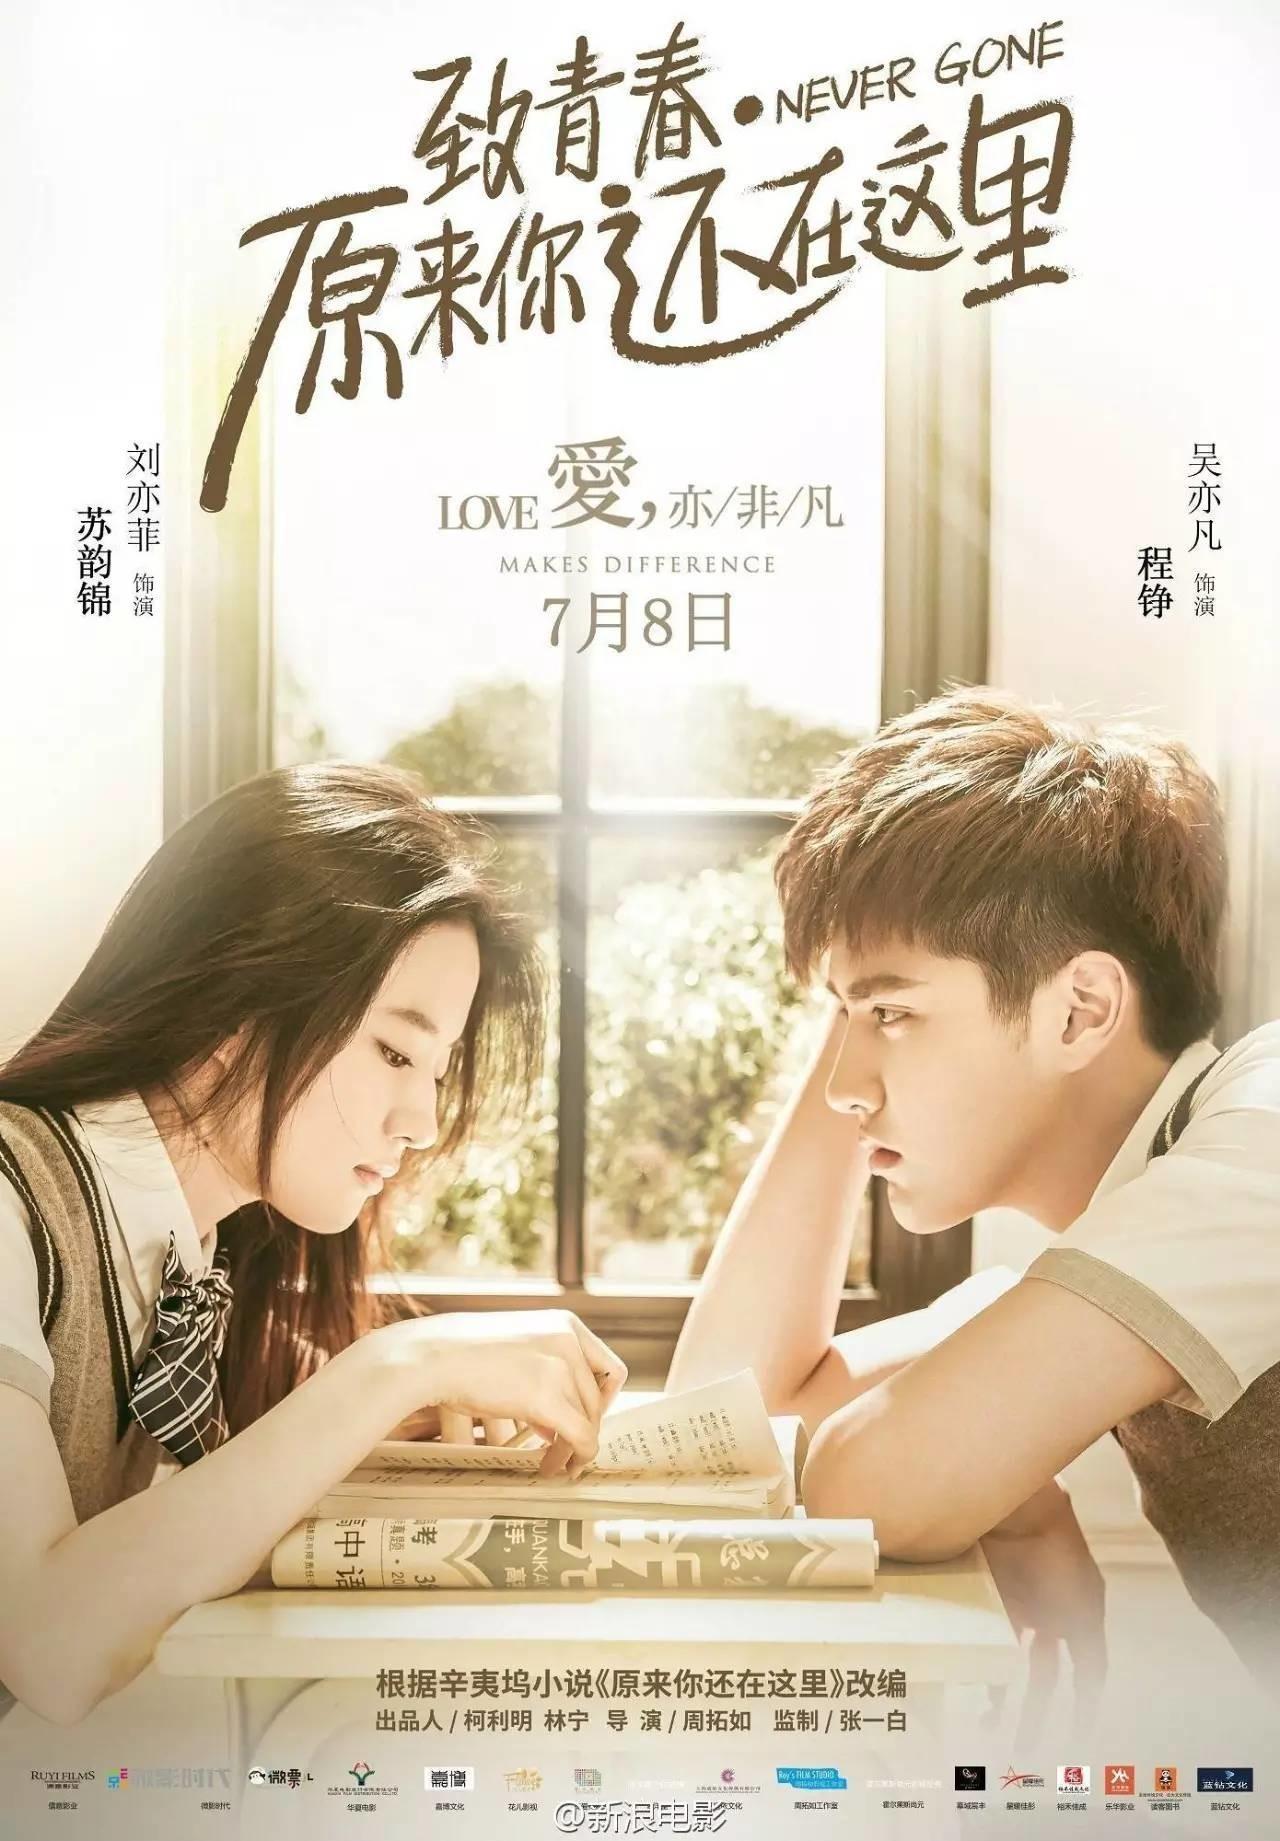 Film Review Kris Wu And Liu Yifeis Never Gone